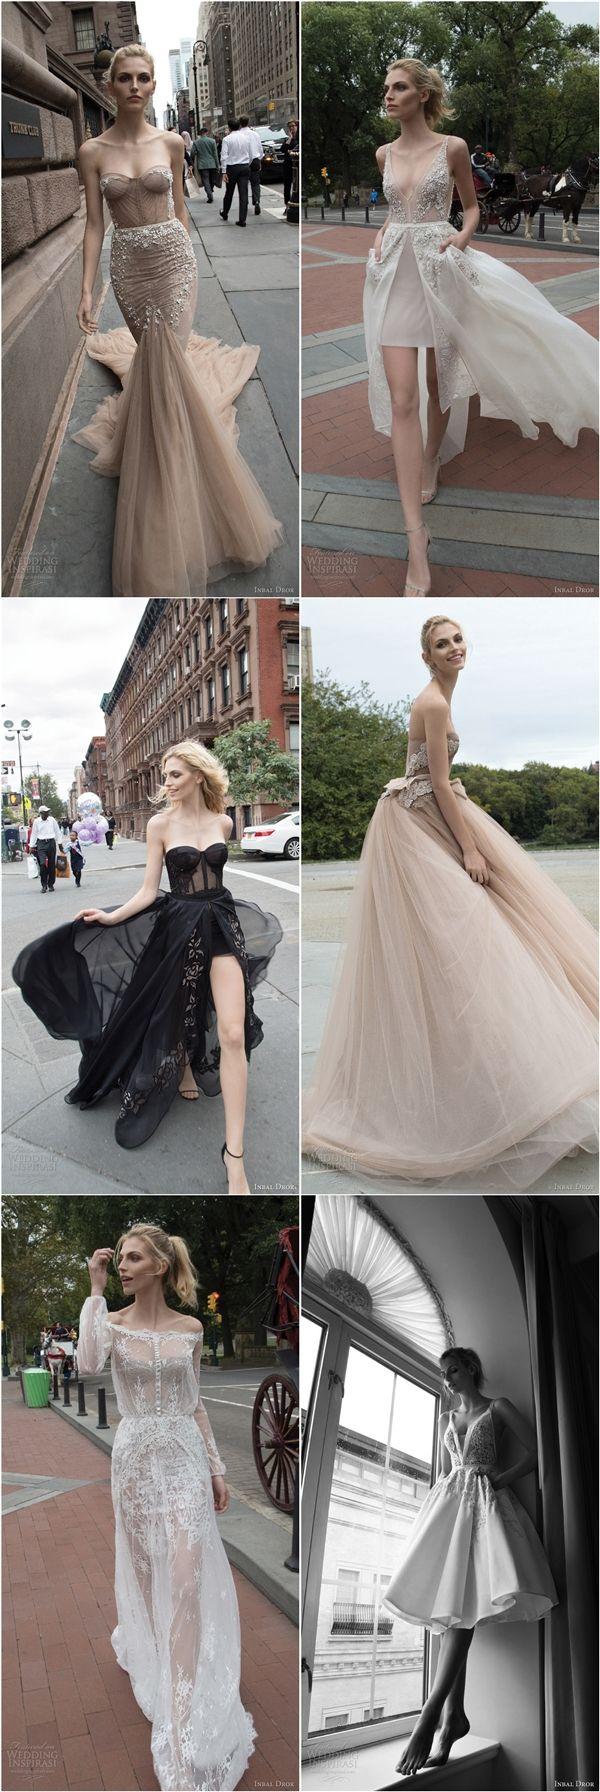 Inbal Dror 2016 wedding dresses / http://www.deerpearlflowers.com/inbal-dror-fall-wedding-dresses-2016-new-york-colletion/